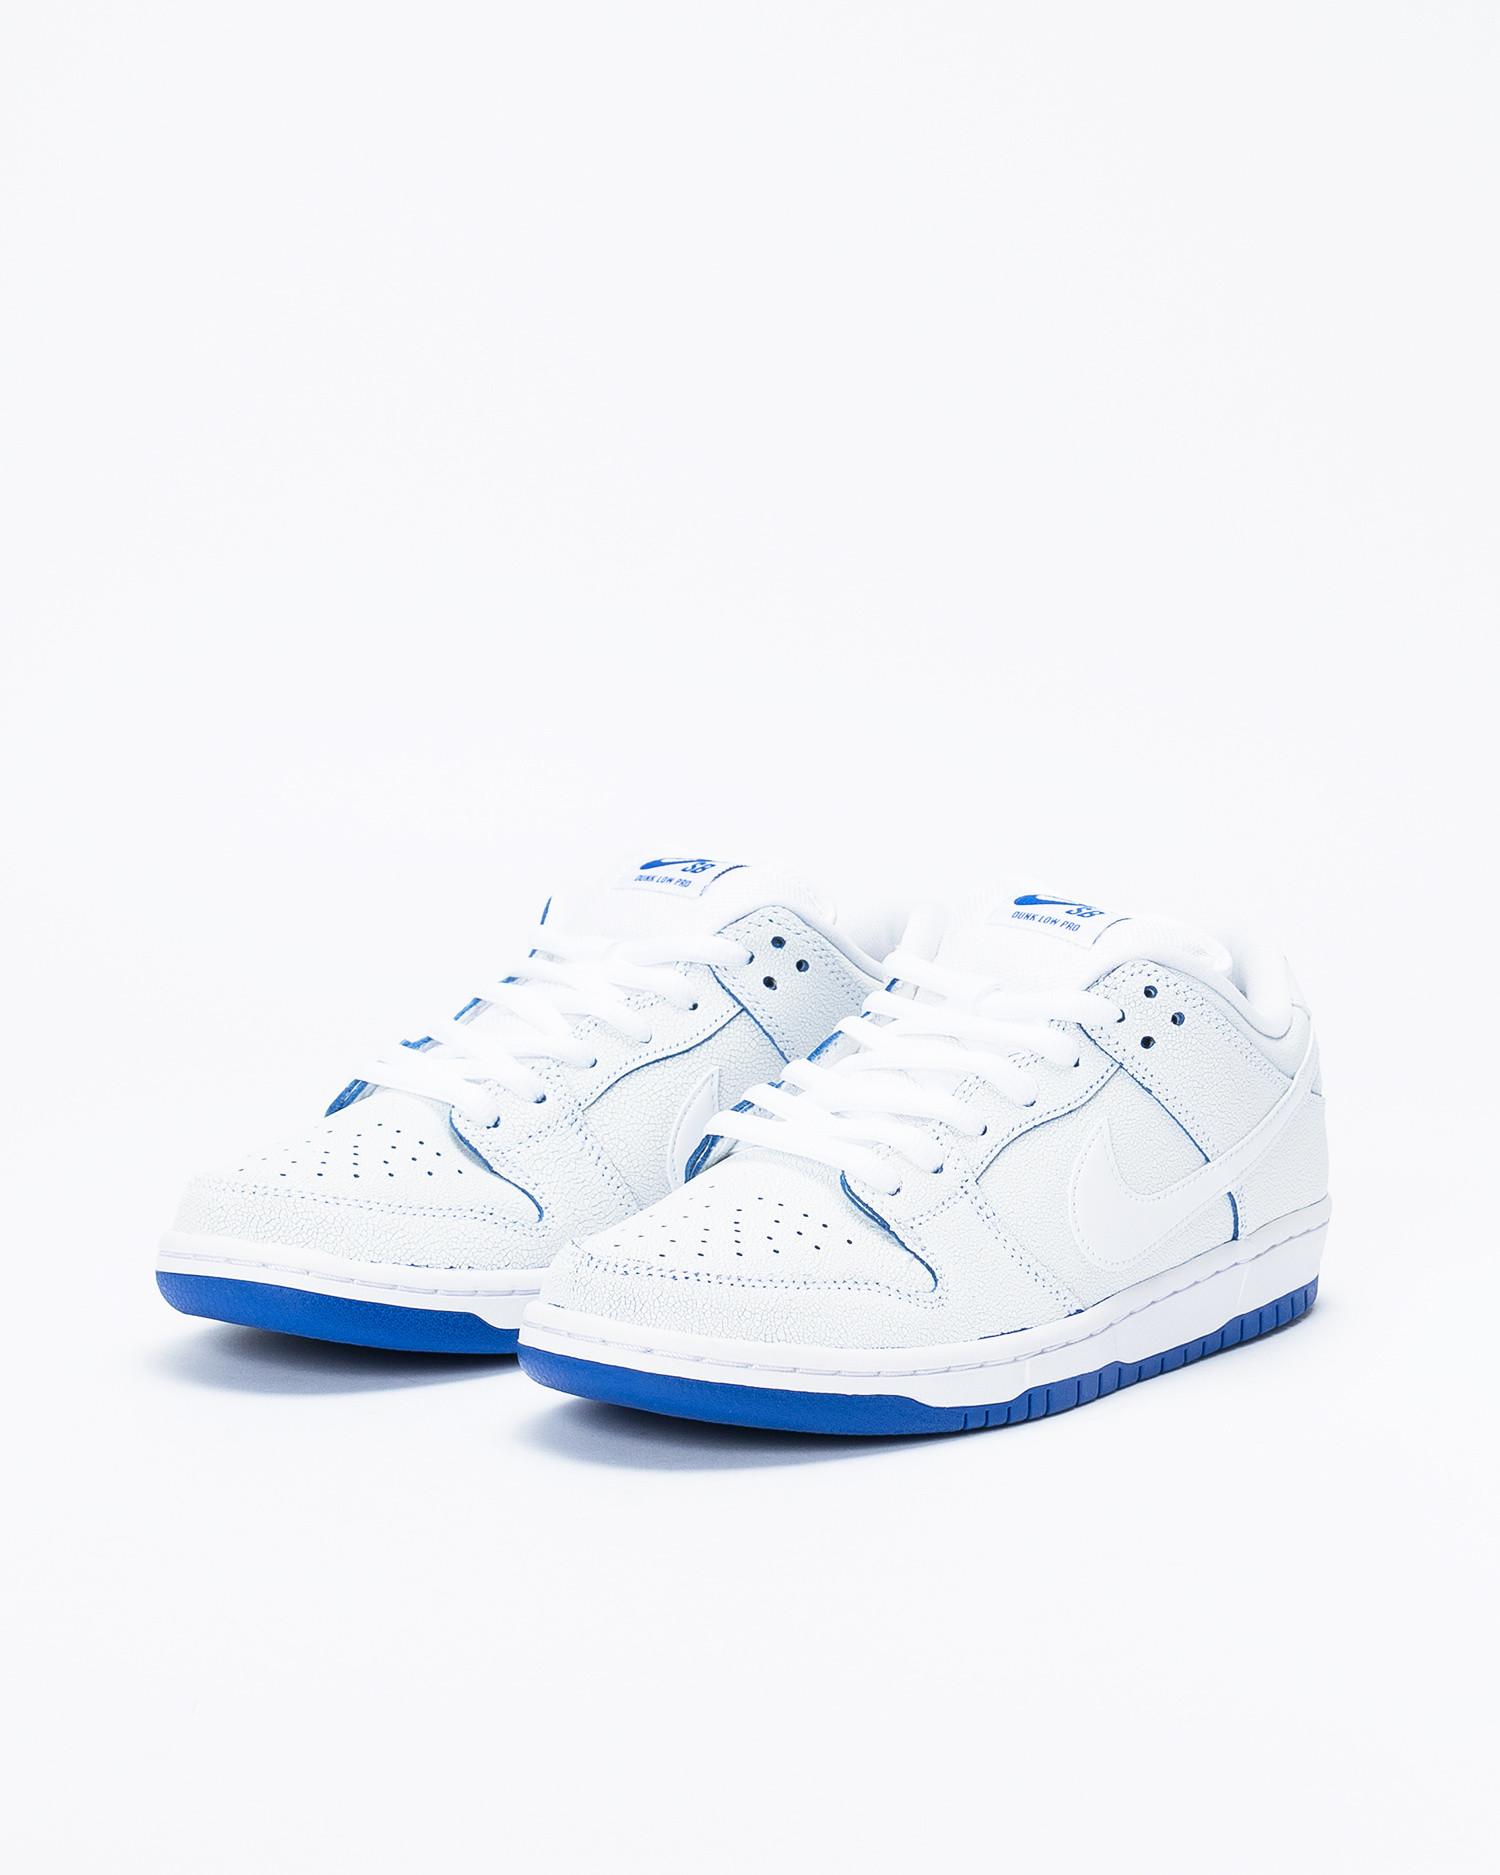 big sale f5297 6eec0 Nike SB Dunk Low Pro Premium White/White